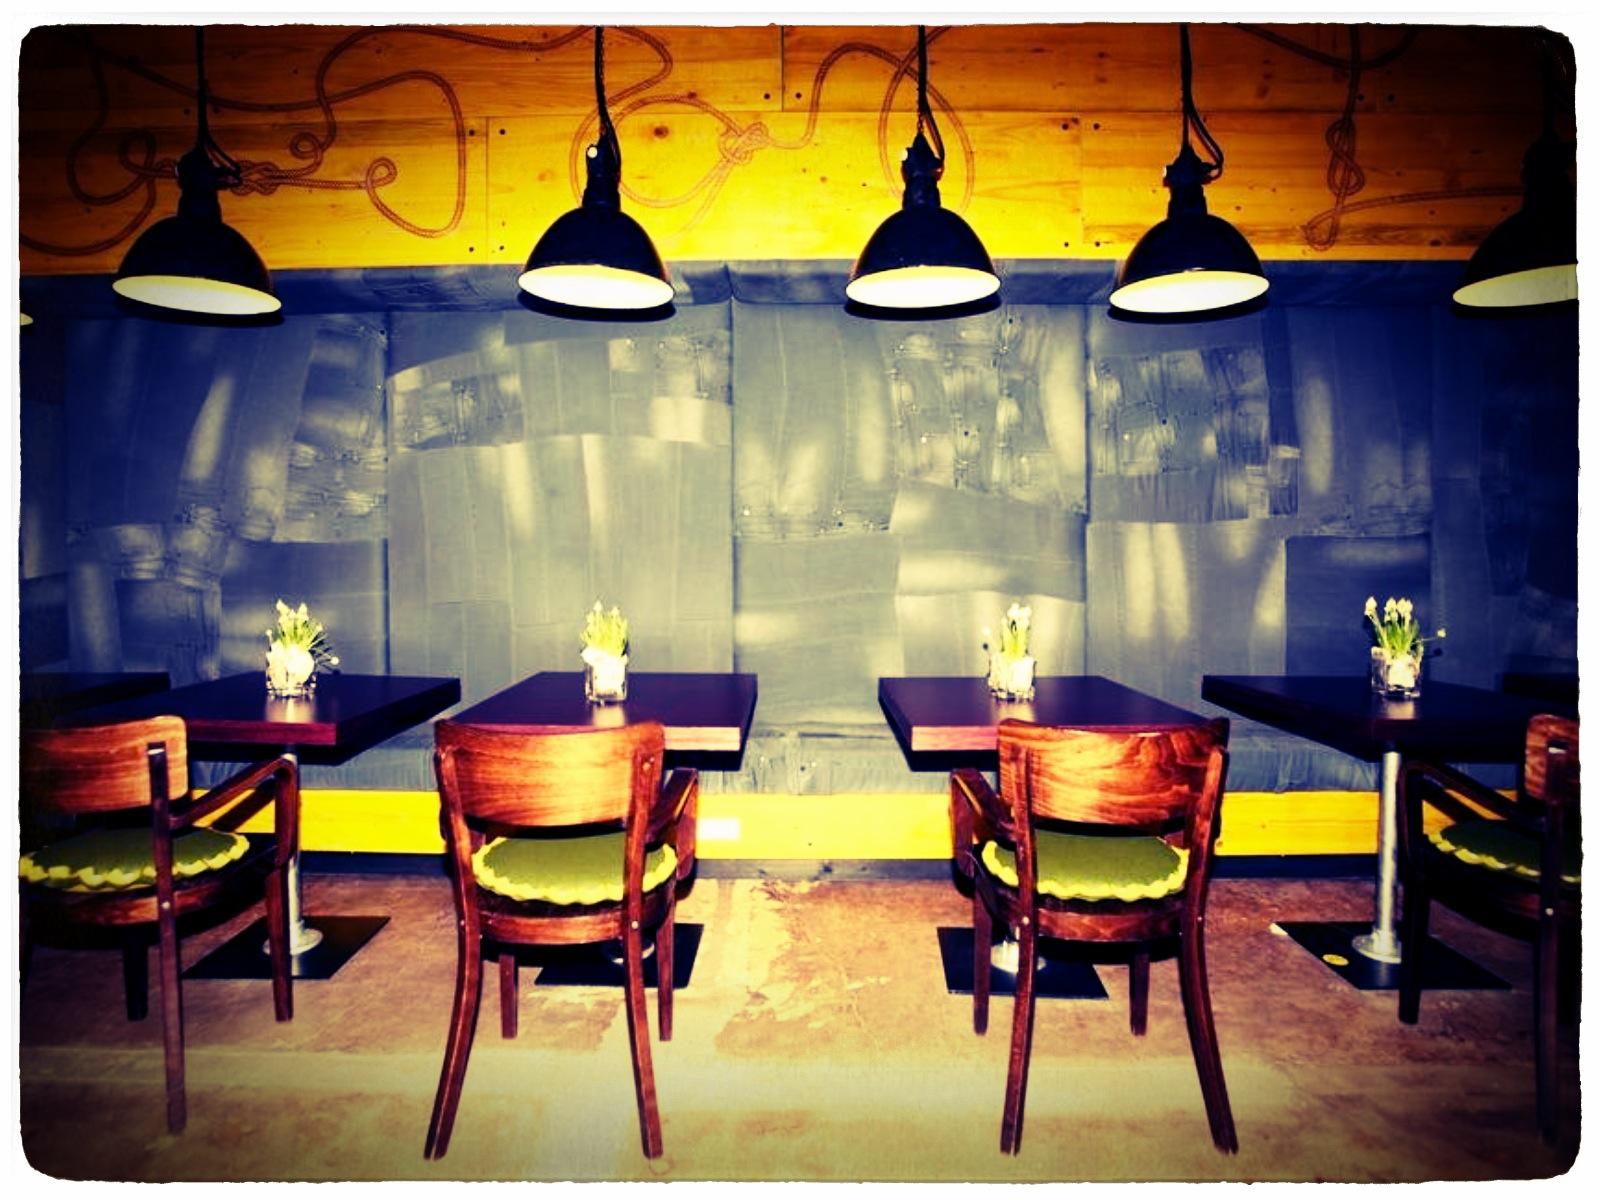 ryans air adventures superbude st pauli hamburg photos. Black Bedroom Furniture Sets. Home Design Ideas